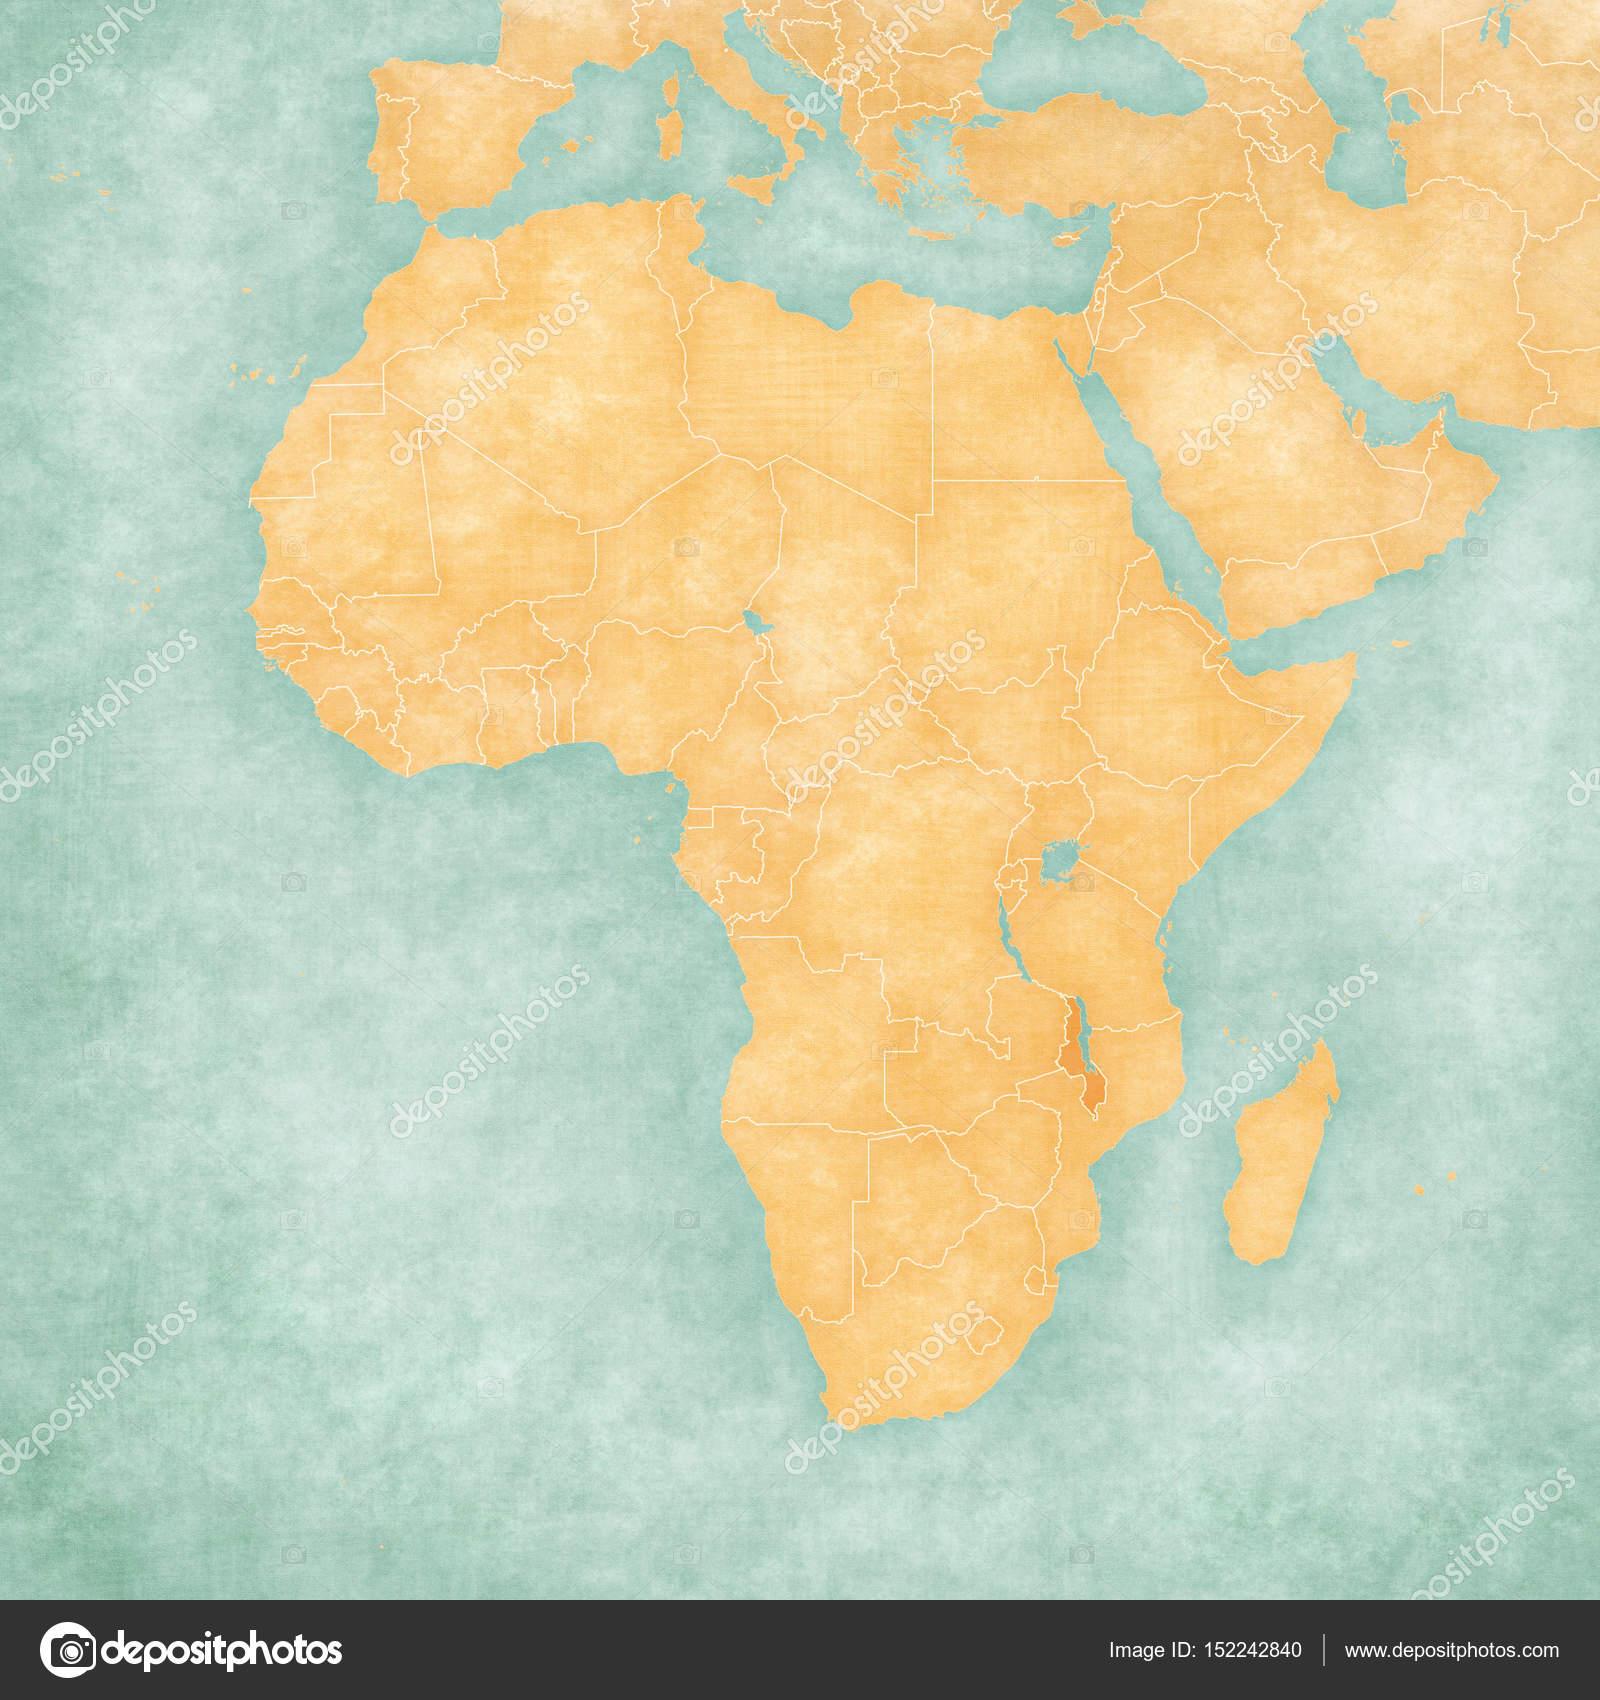 Malawi On Africa Map.Map Of Africa Malawi Stock Photo C Tindo 152242840